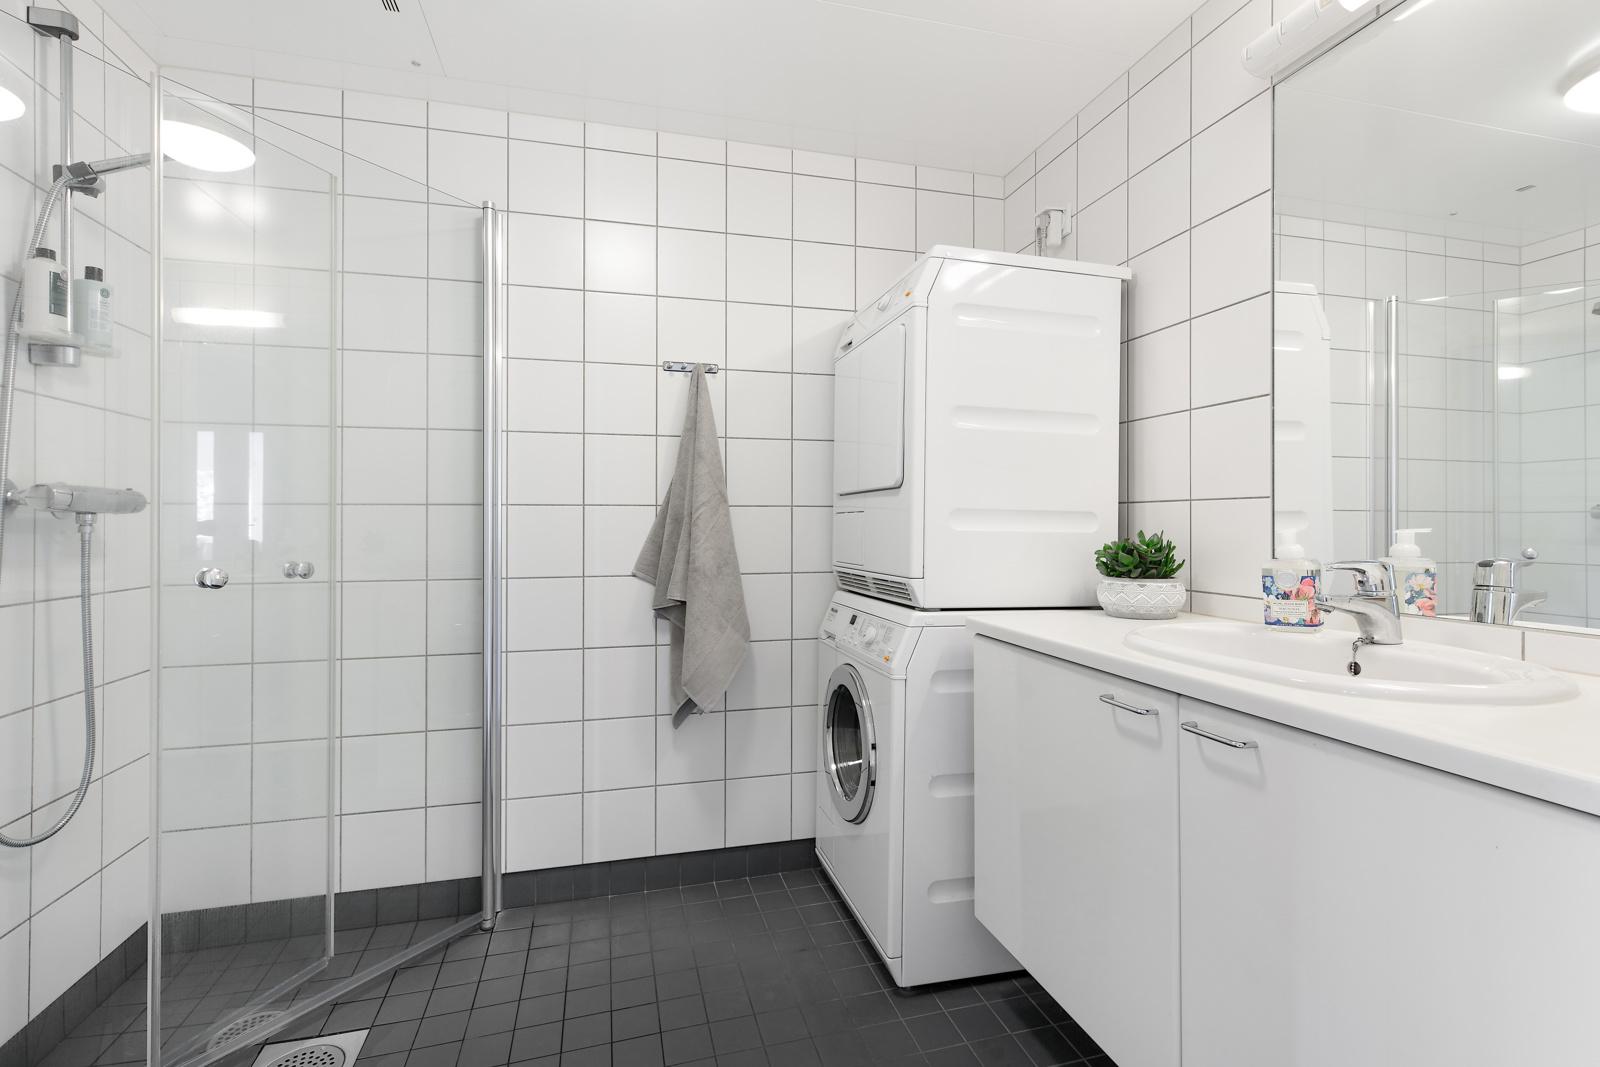 Flislagt bad/wc med varme i gulv, dusjvegger og plass for vaskemaskin.